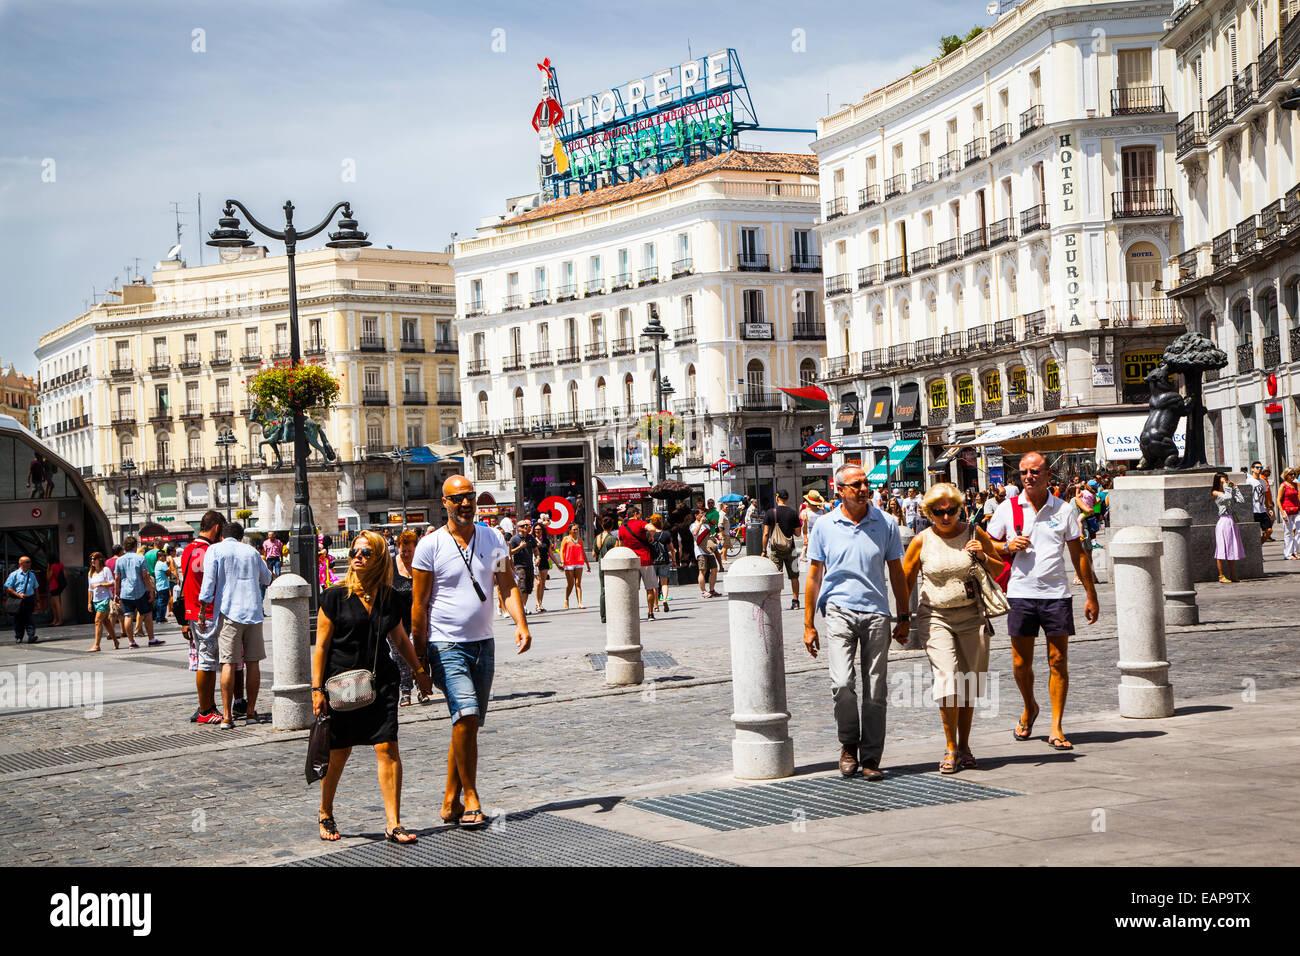 Madrid city centre puerta del sol stock photo royalty for Como llegar puerta del sol